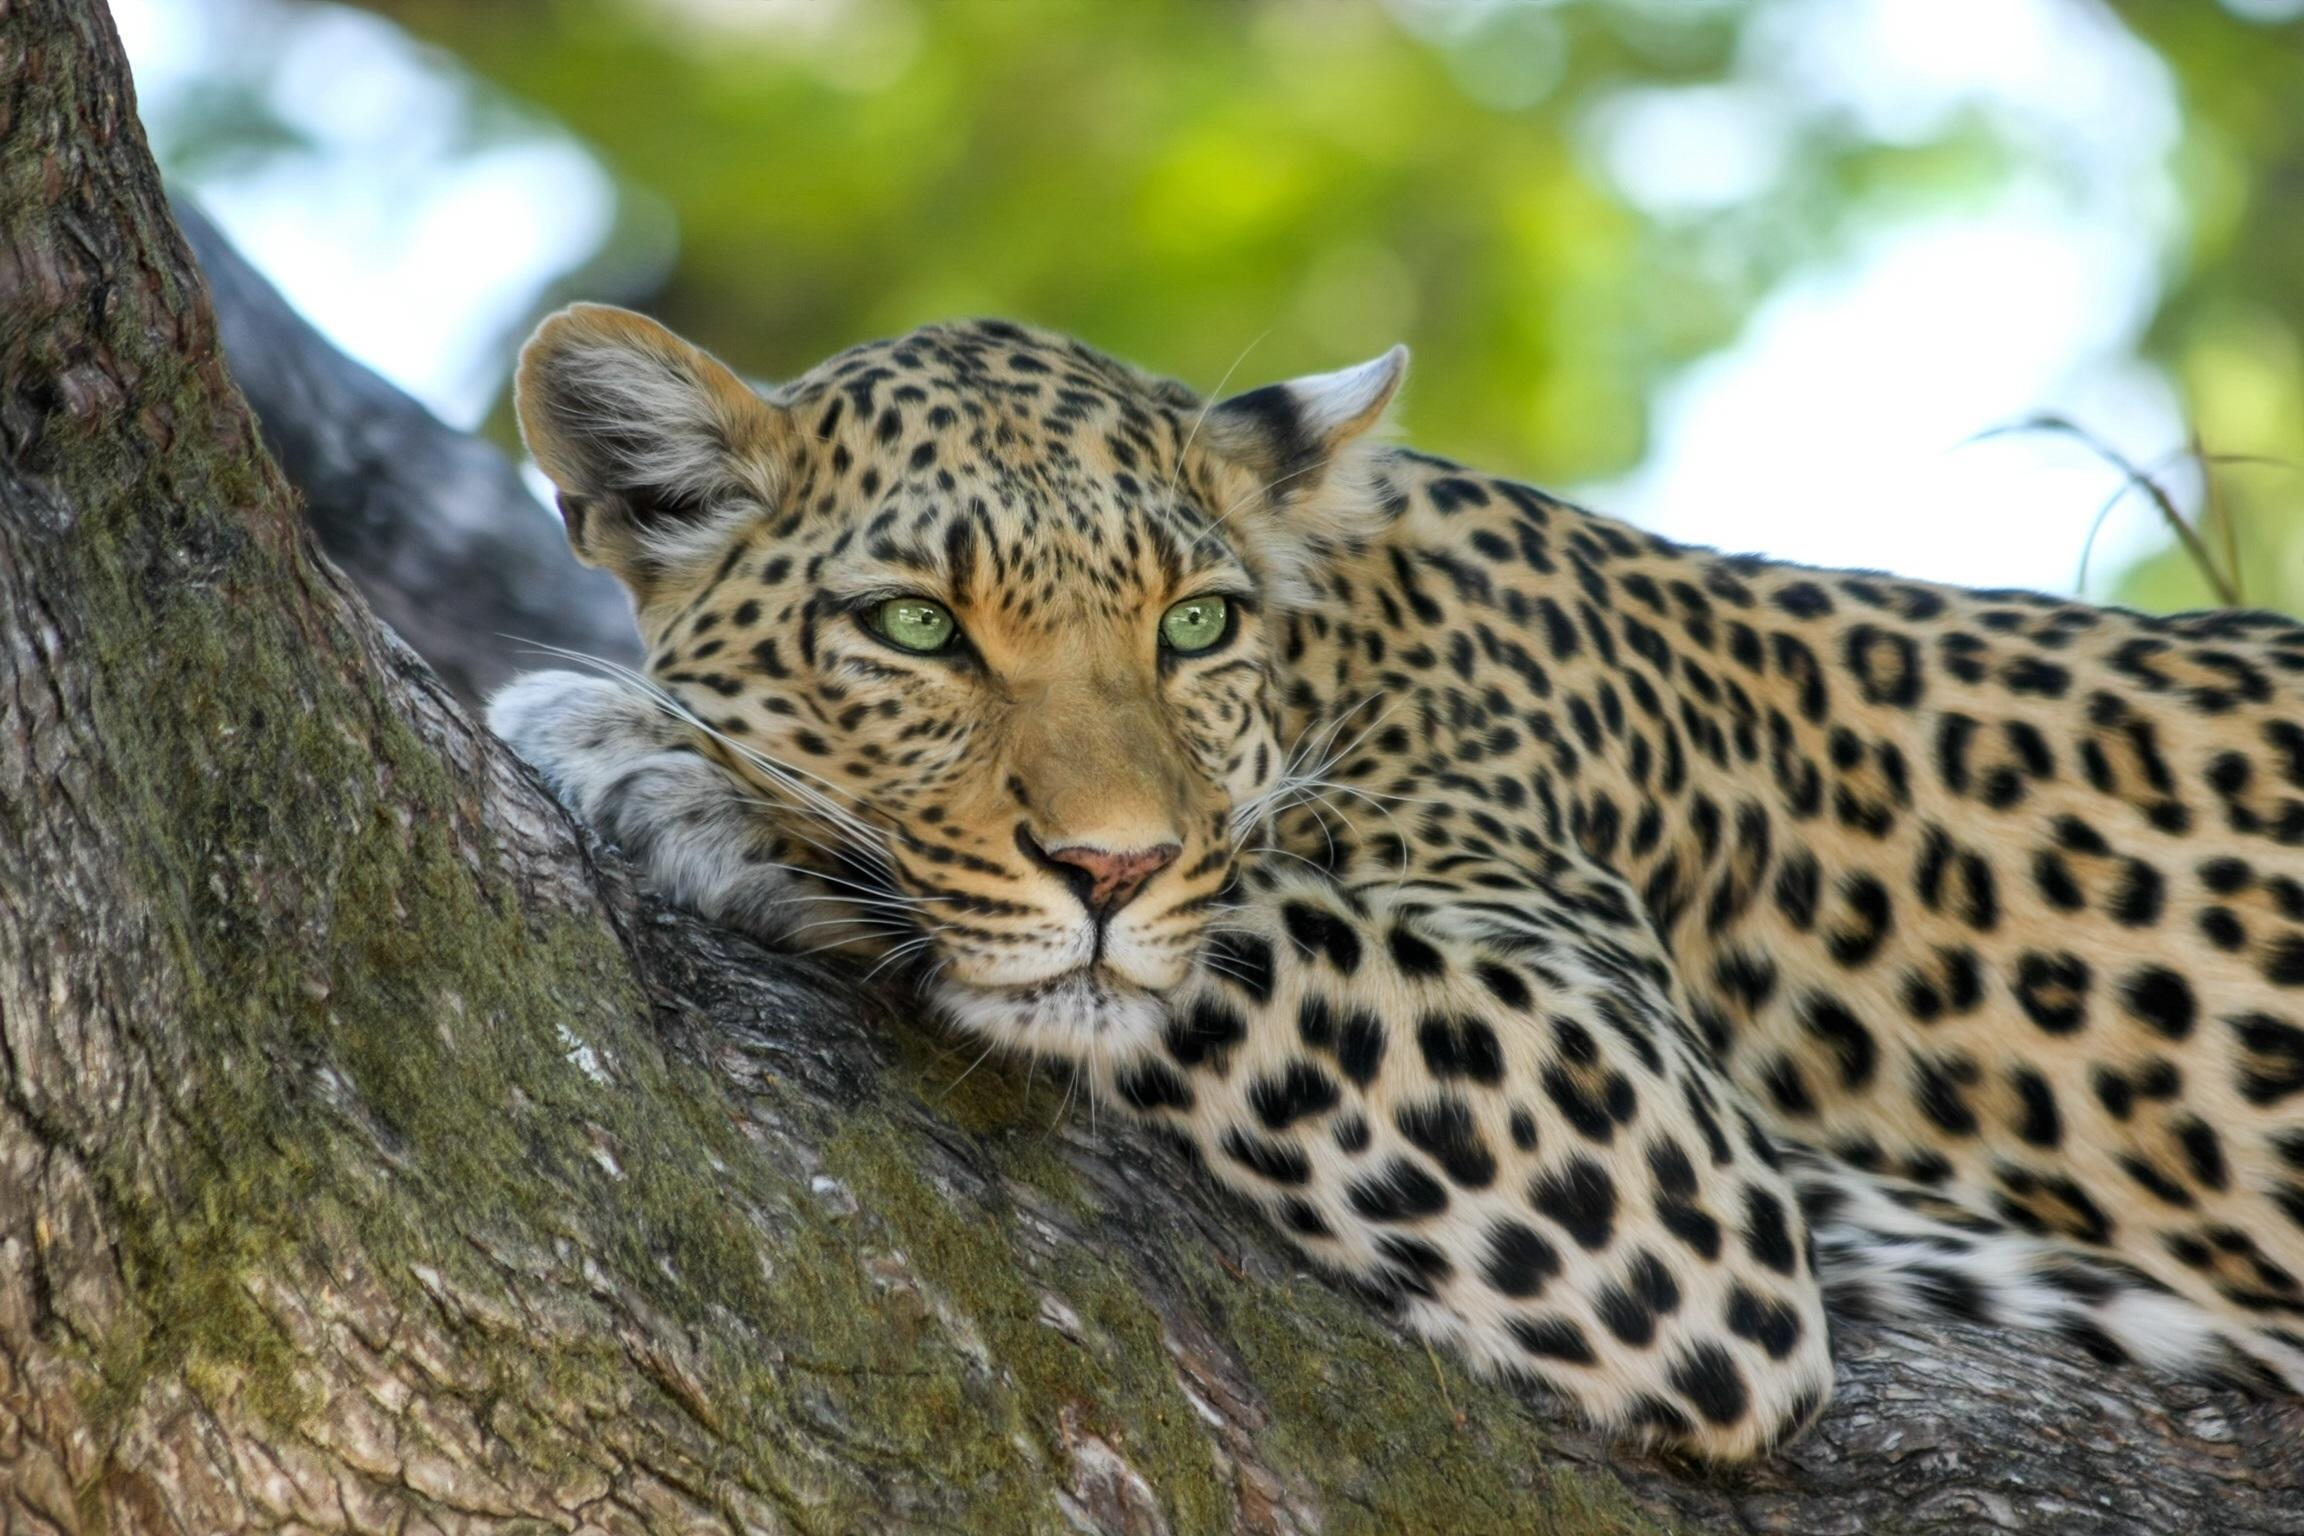 leopard-wildcat-big-cat-botswana-46254.jpeg